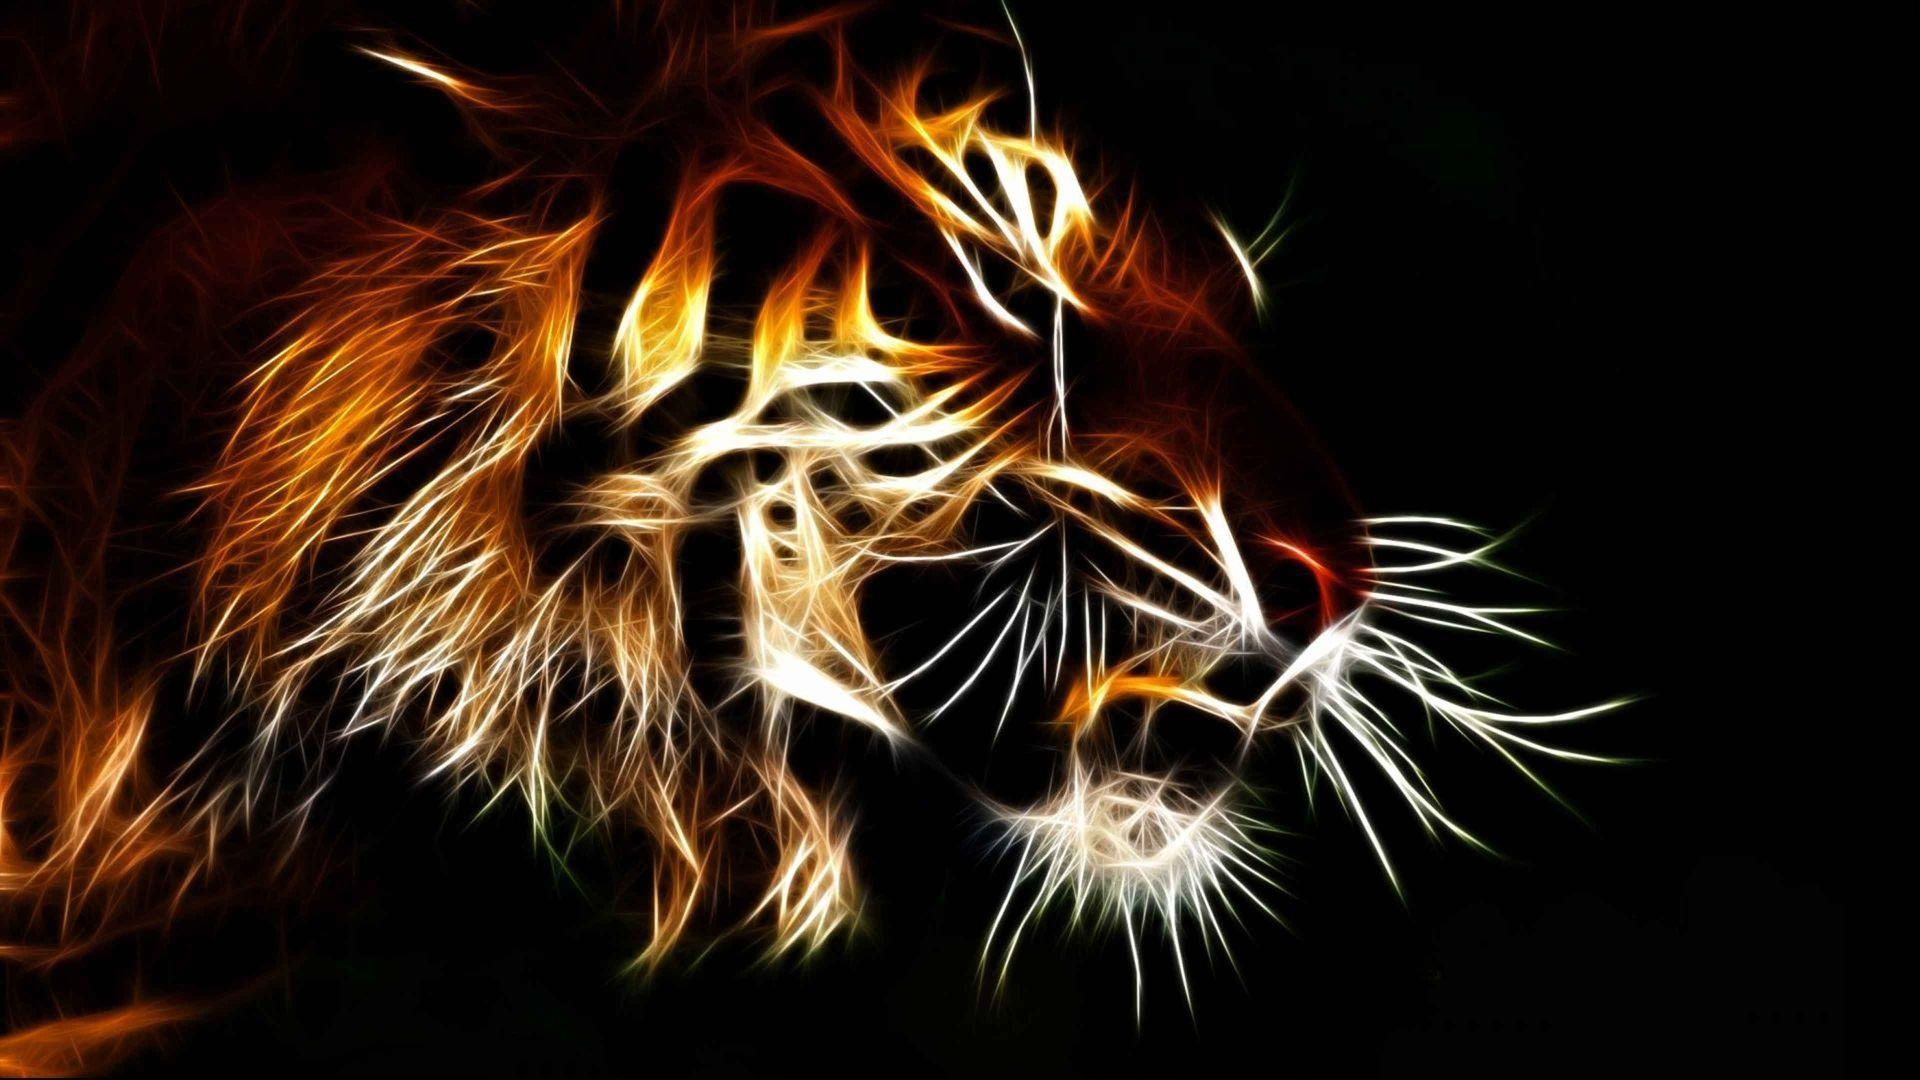 Tiger Art, Background Wallpaper HD